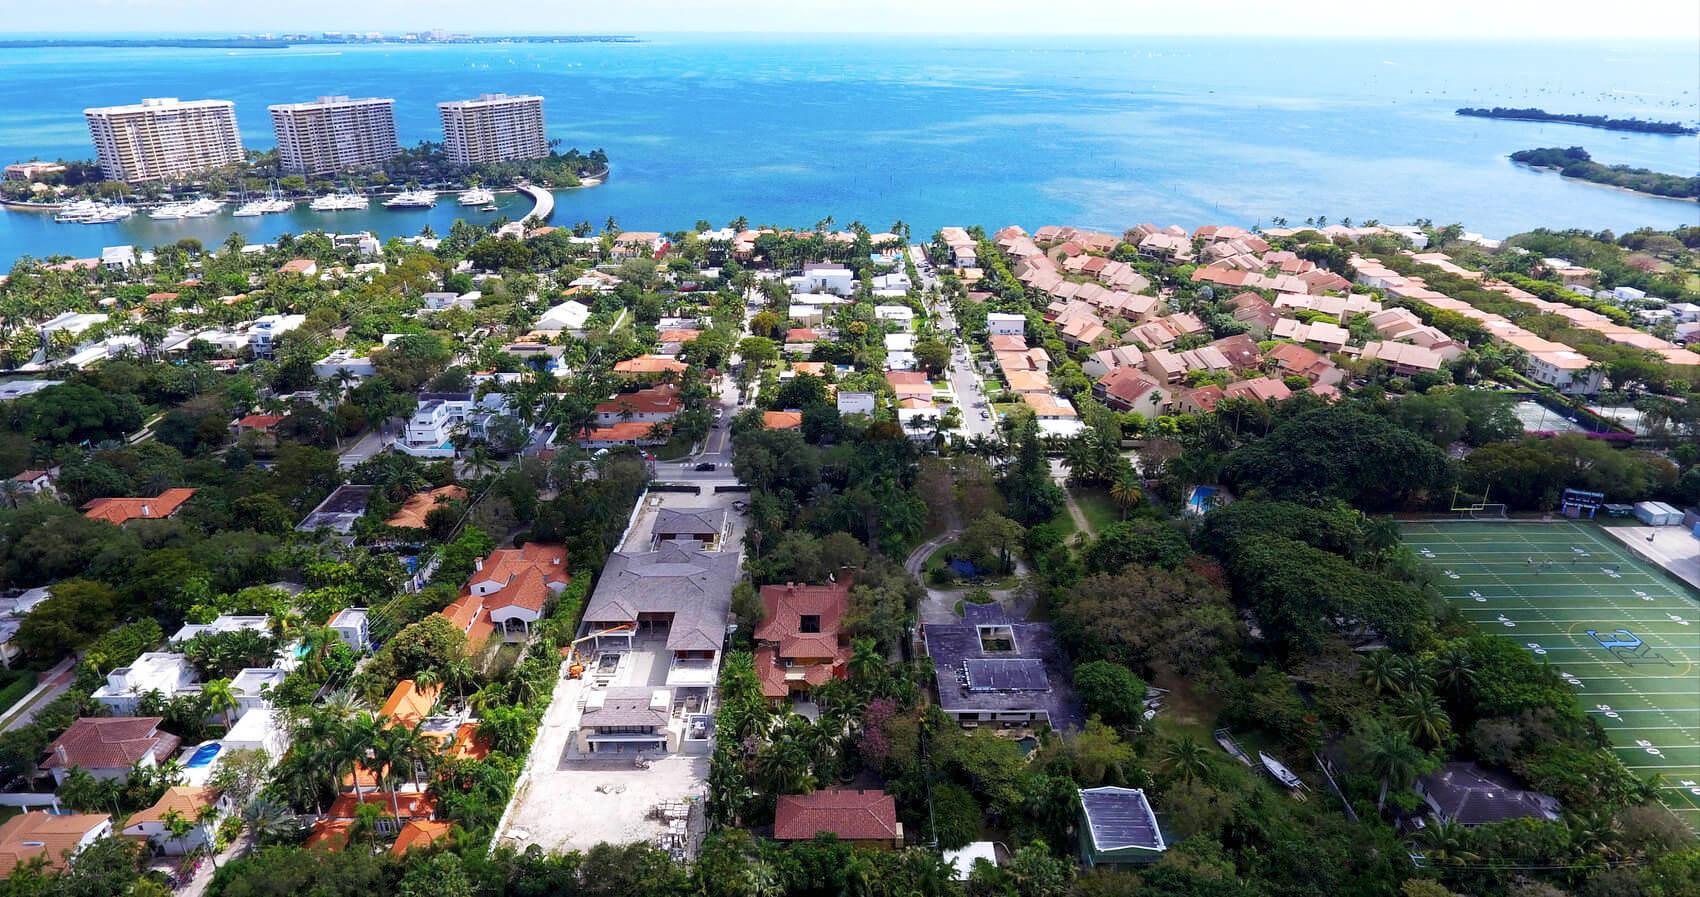 02__coconut_grove_aerial_photo_by_MiamiRealEstatePhotographers.com